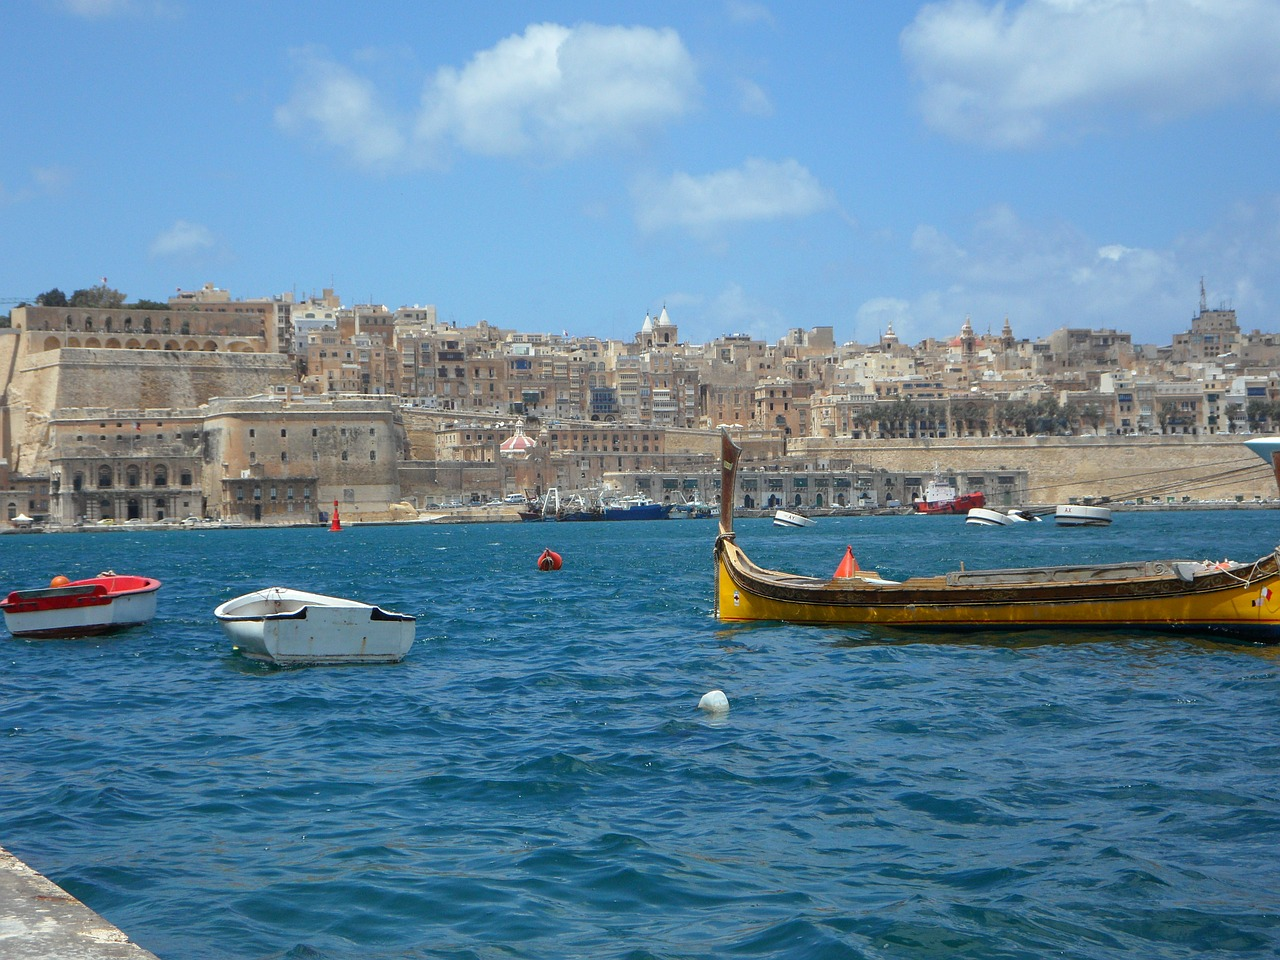 Baskent Valletta